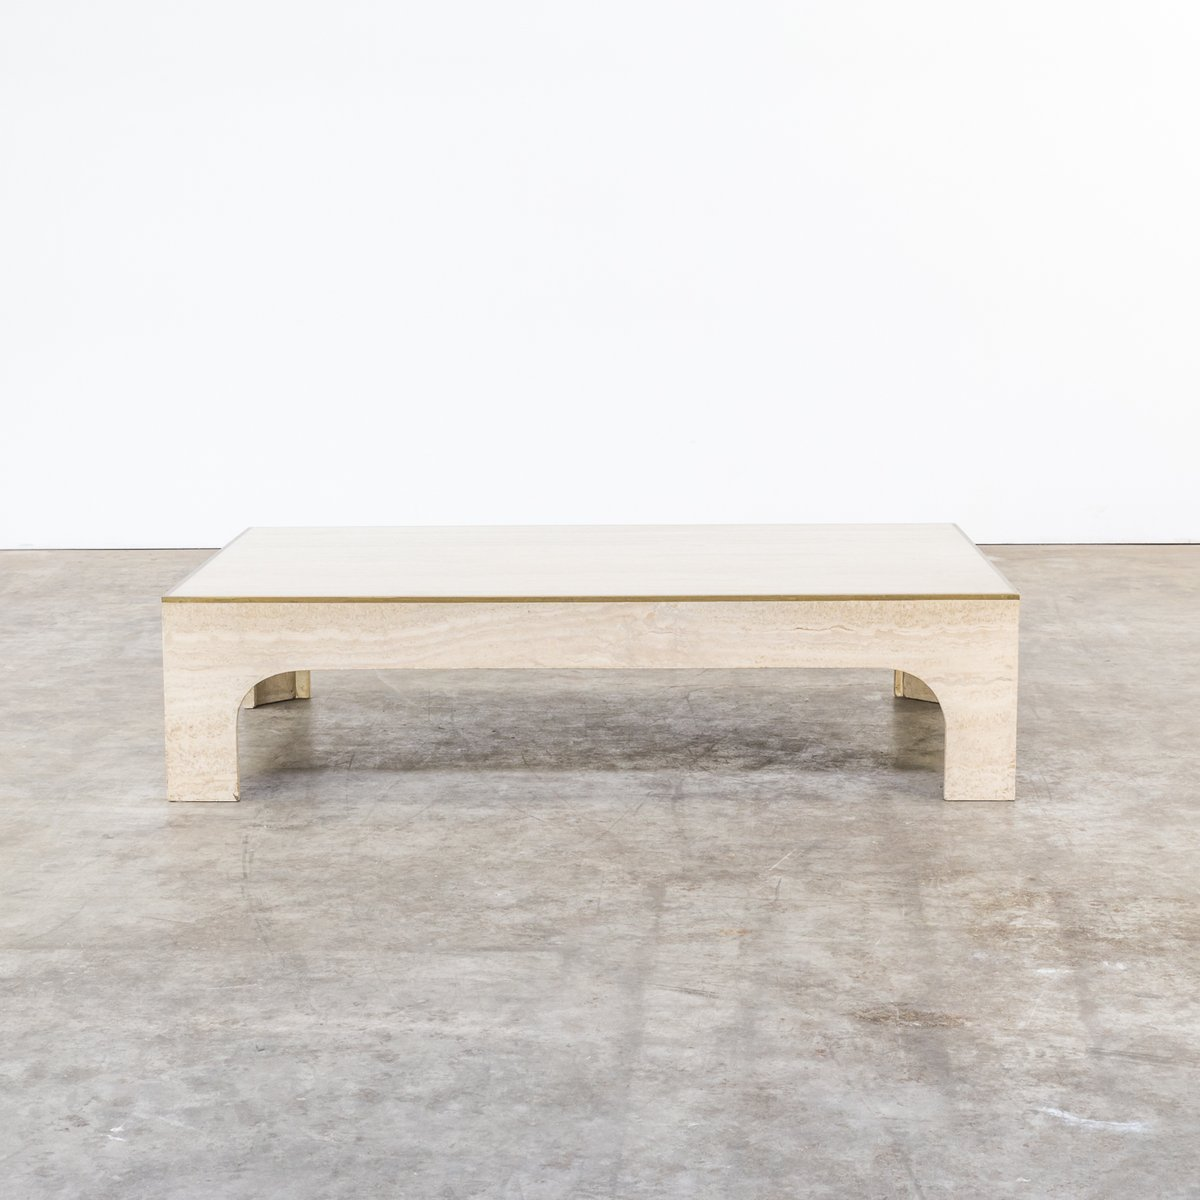 table basse en bronze et travertin par willy rizzo 1970s. Black Bedroom Furniture Sets. Home Design Ideas